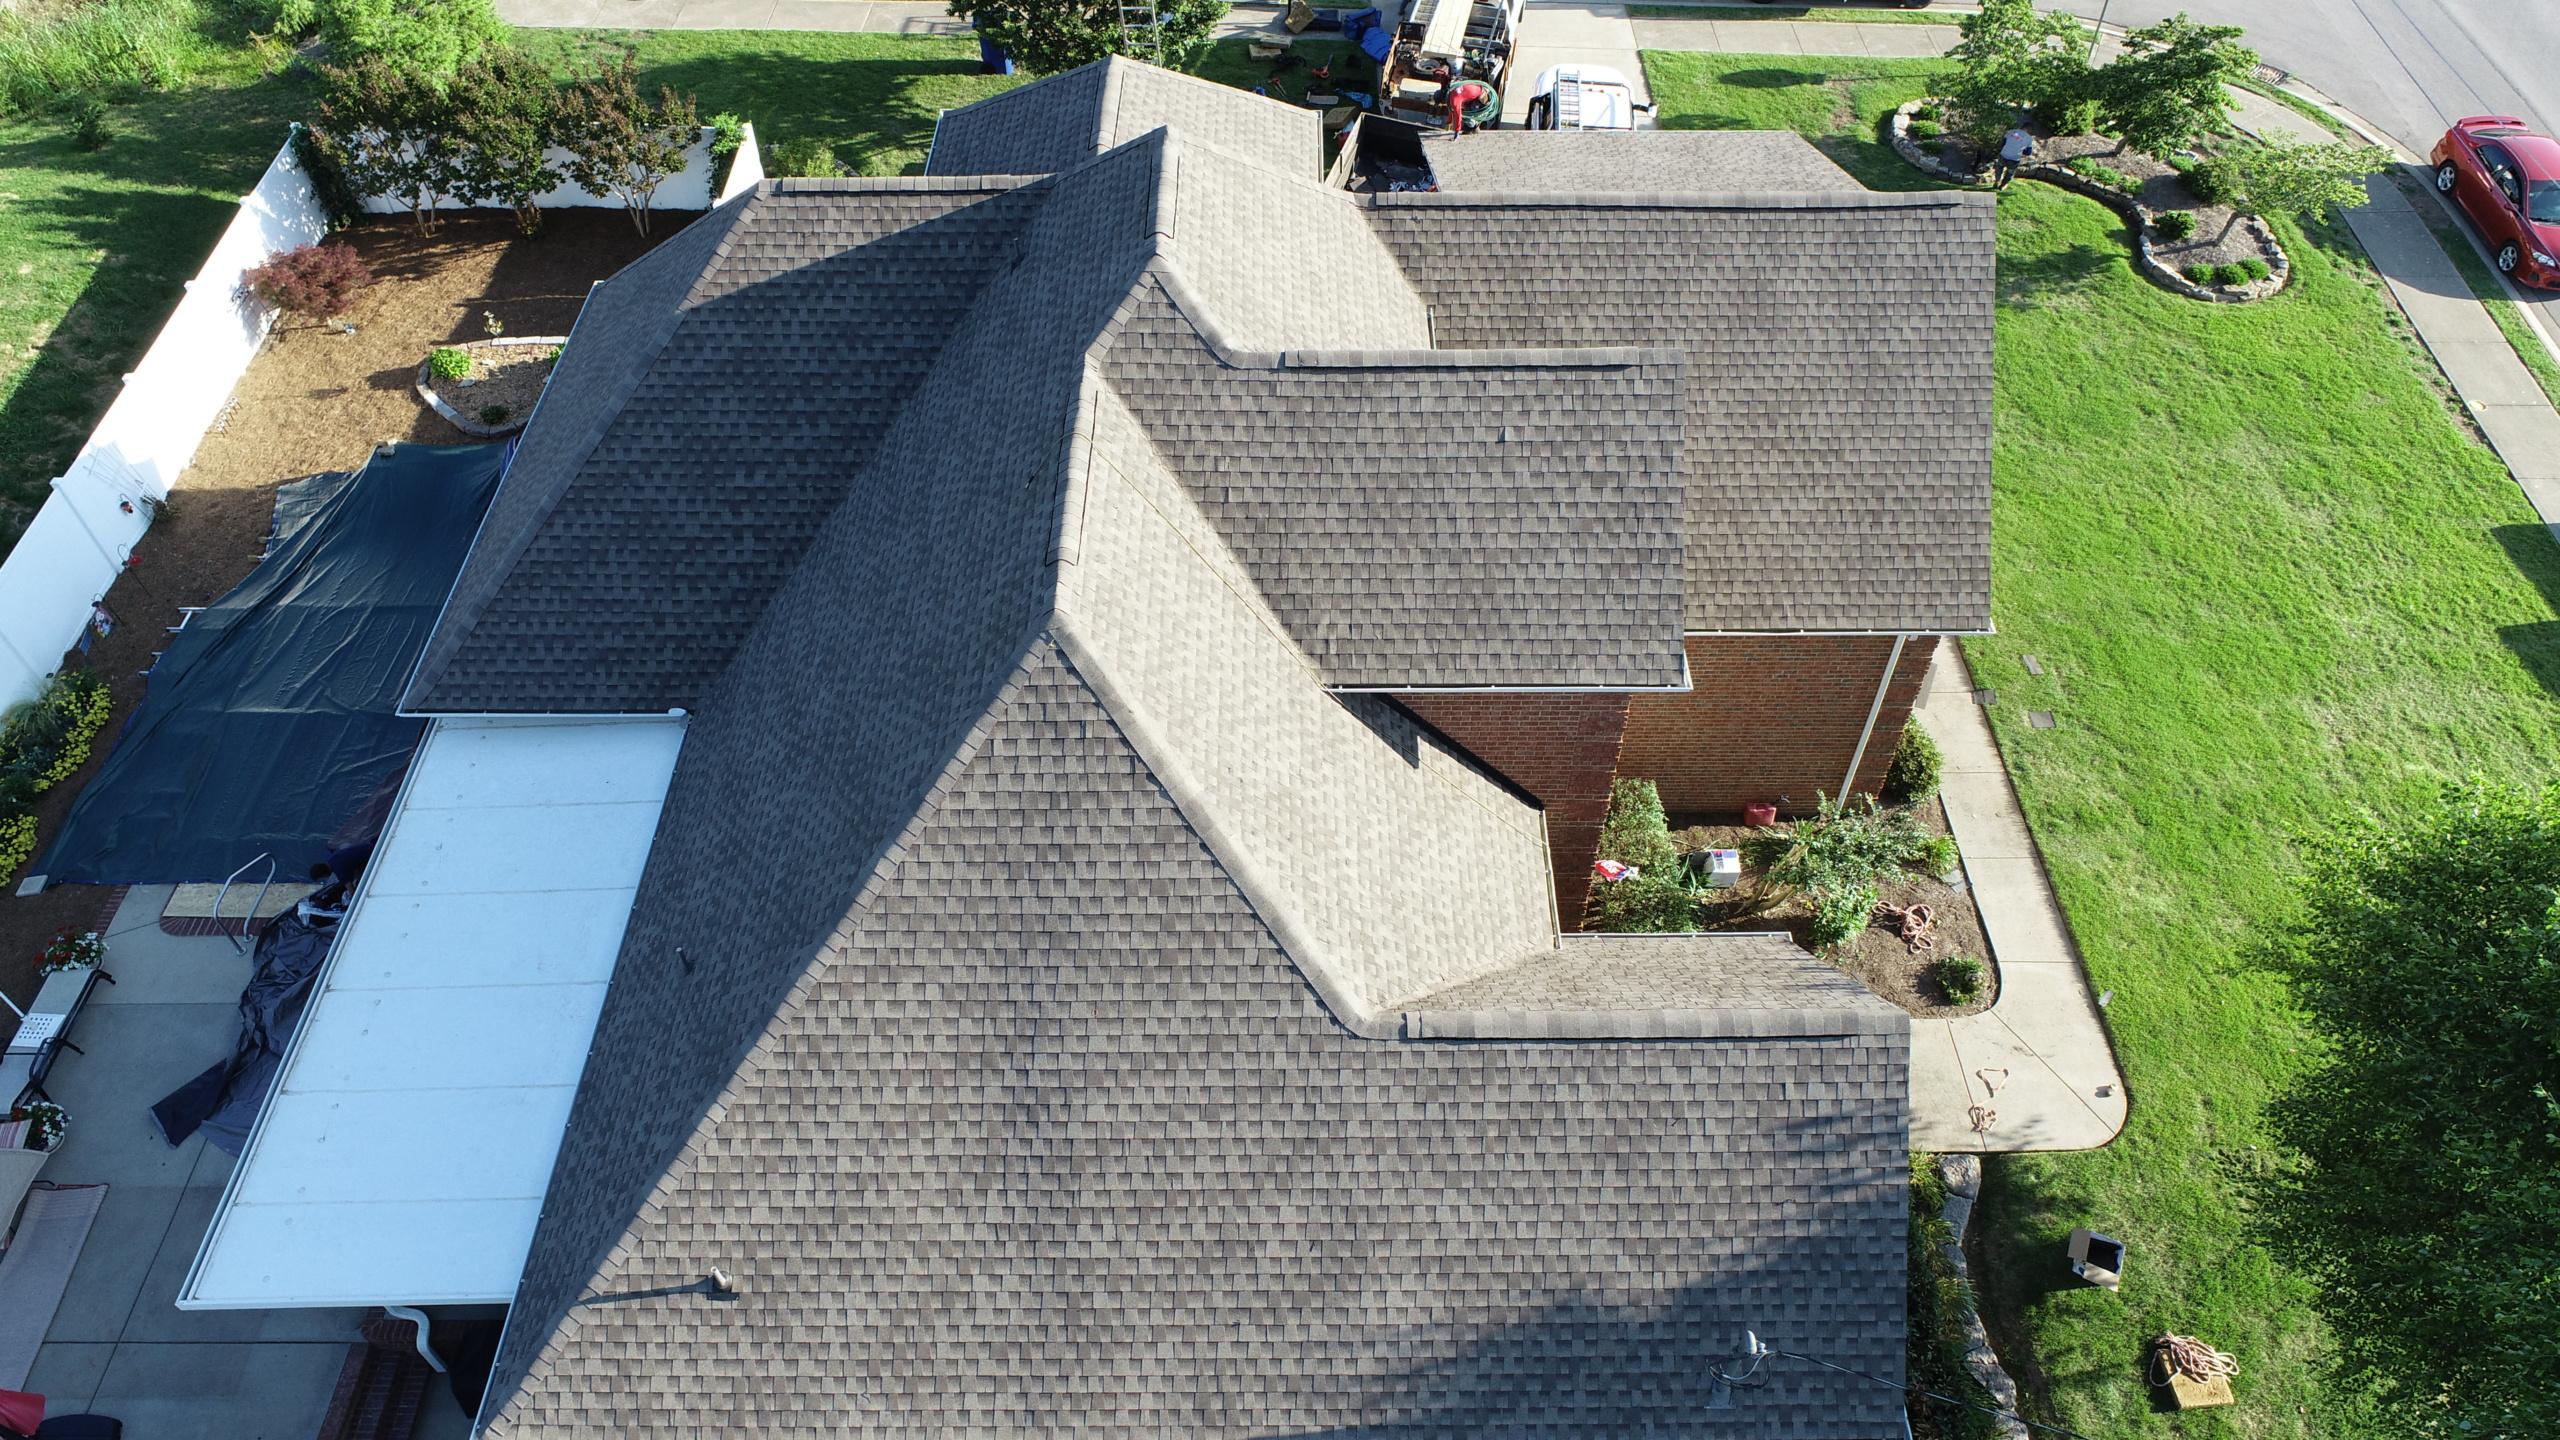 Roofing Murfreesboro GAF Weathered Wood Shingles 2